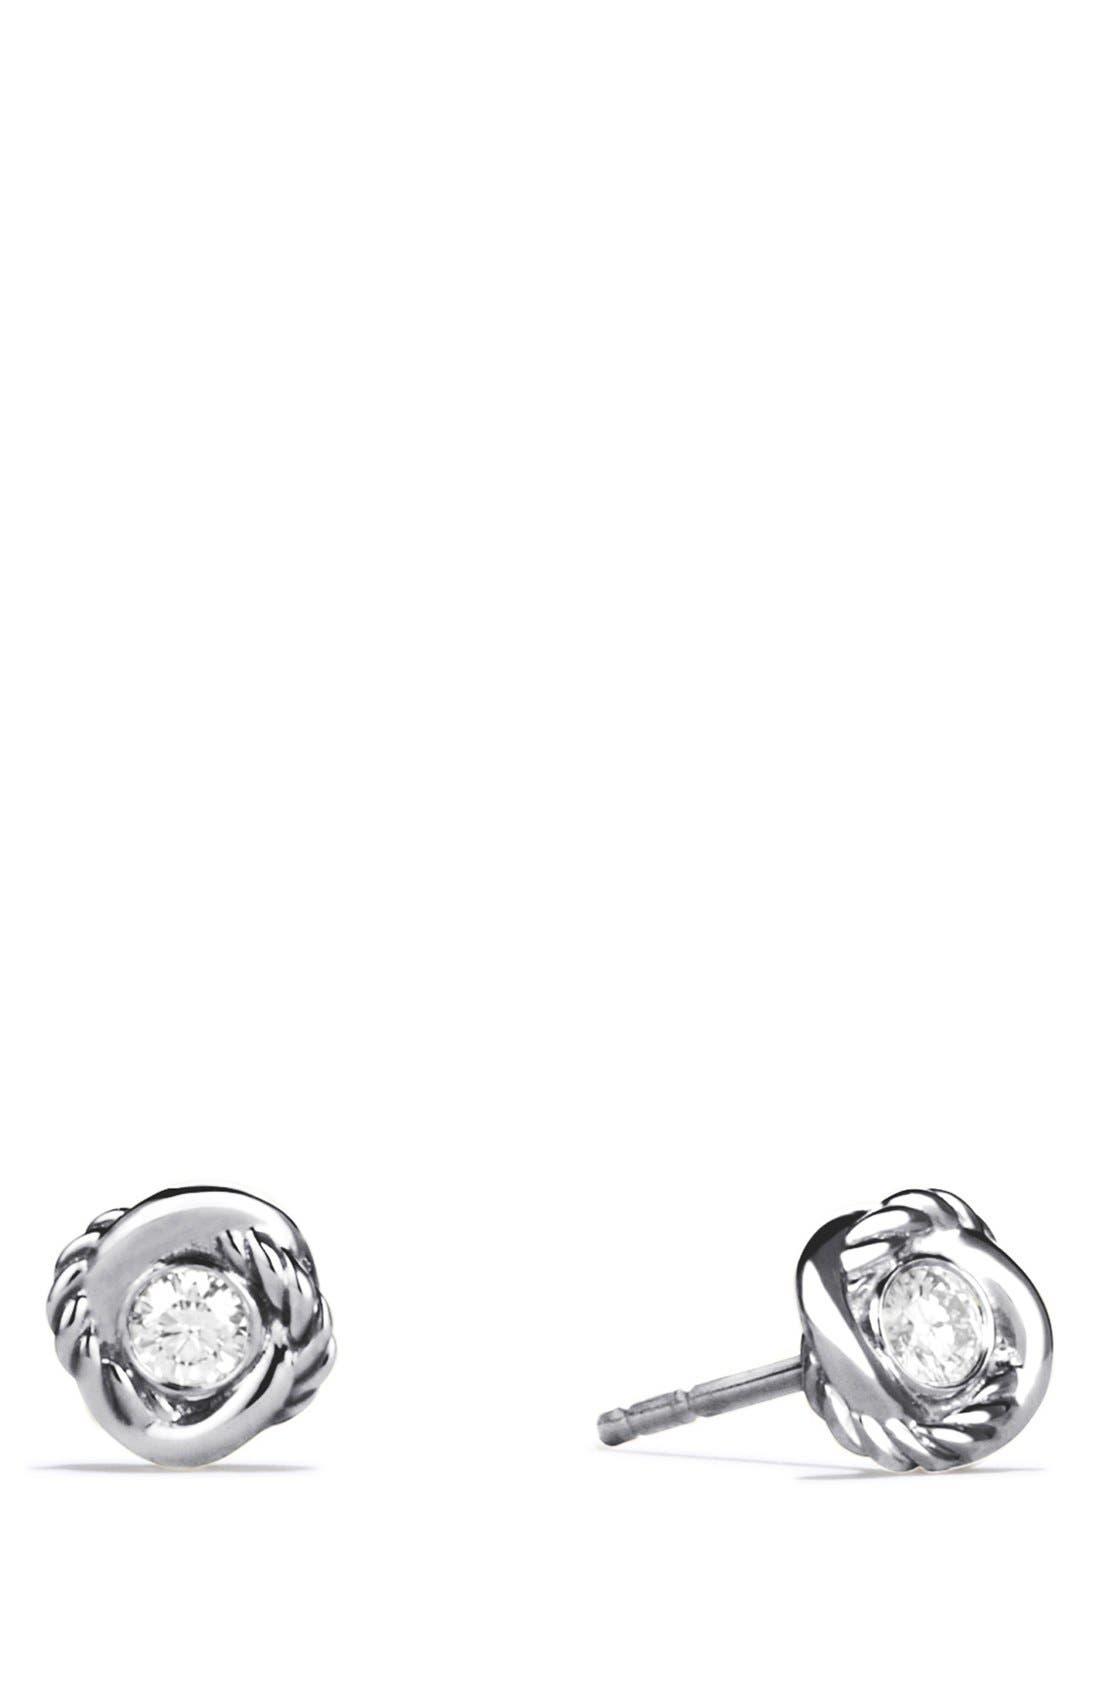 'Infinity' Earrings with Diamonds,                             Main thumbnail 1, color,                             DIAMOND